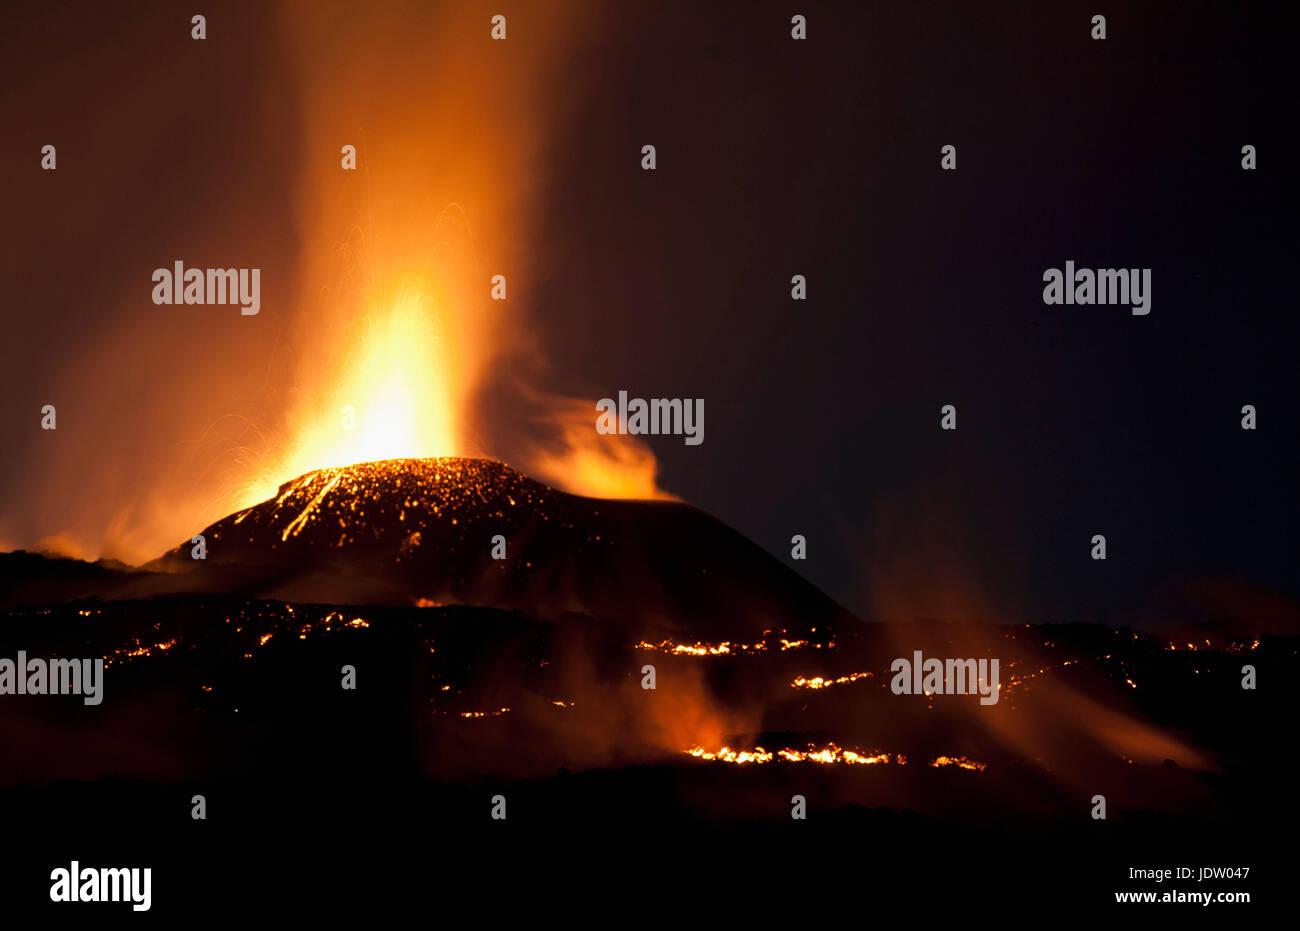 Fimmvorduhals erupting at night - Stock Image